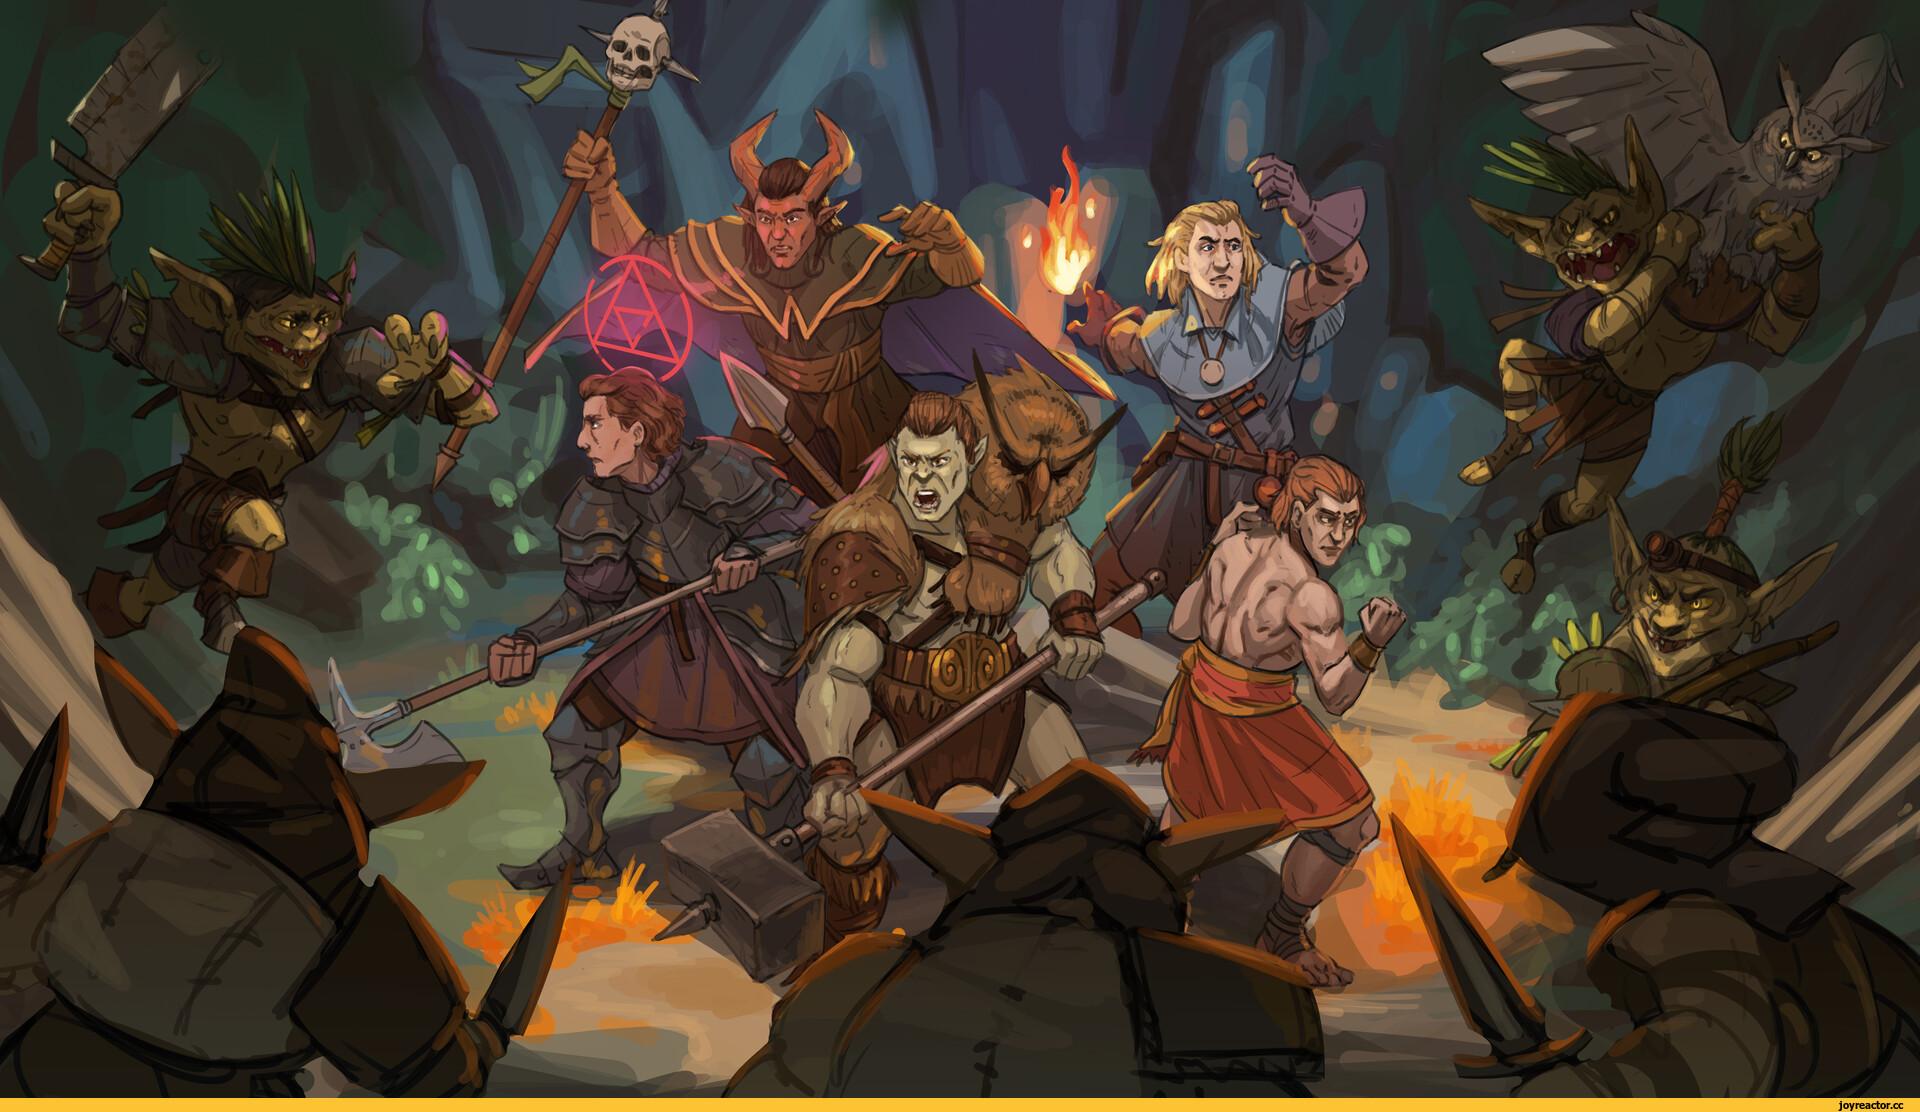 Dungeons & dragons 4